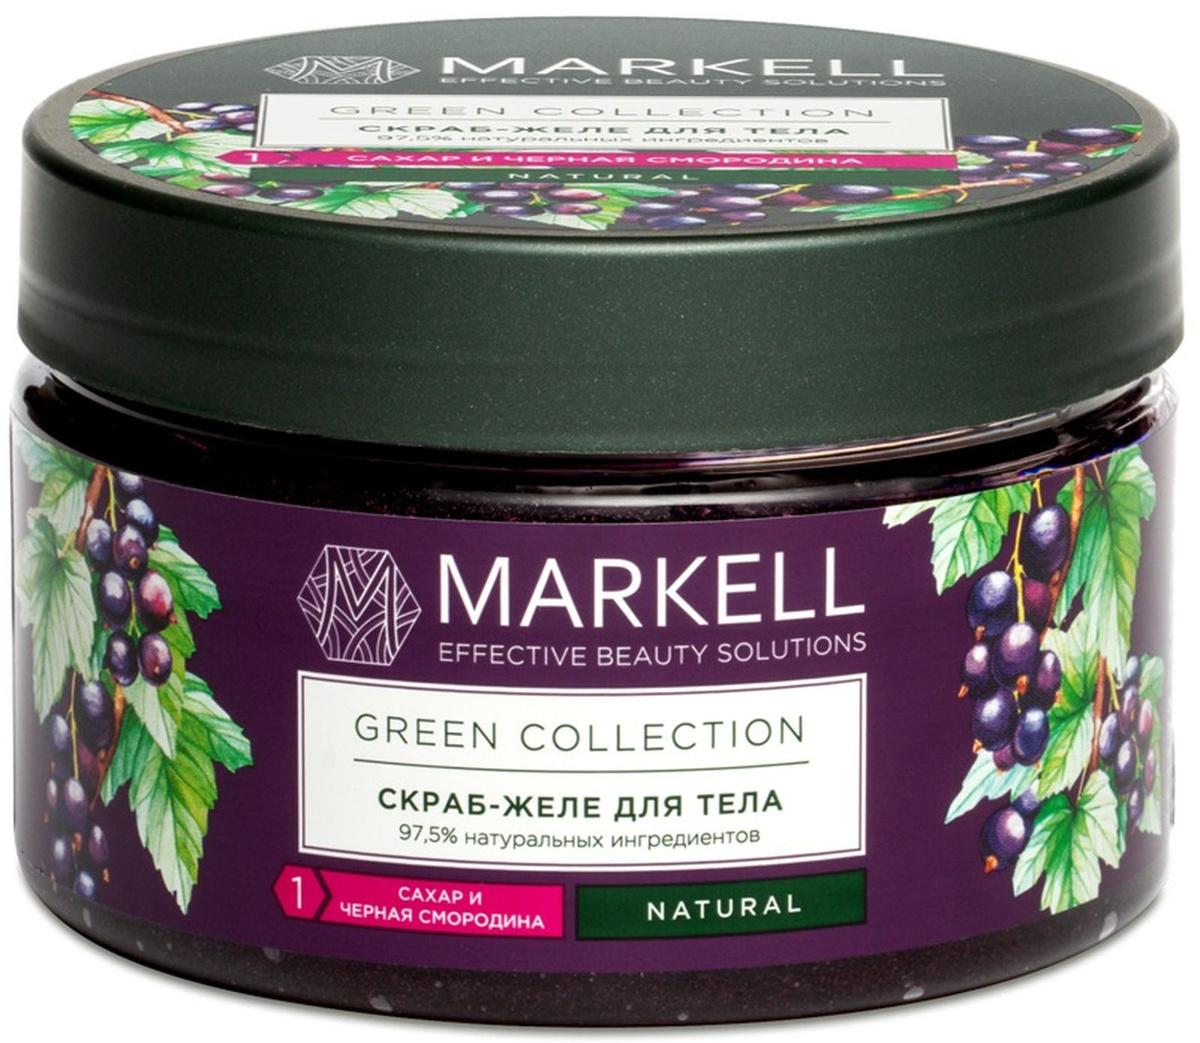 Markell Скраб-желе для тела GREEN COLLECTION сахар и черная смородина, 250 мл  #1